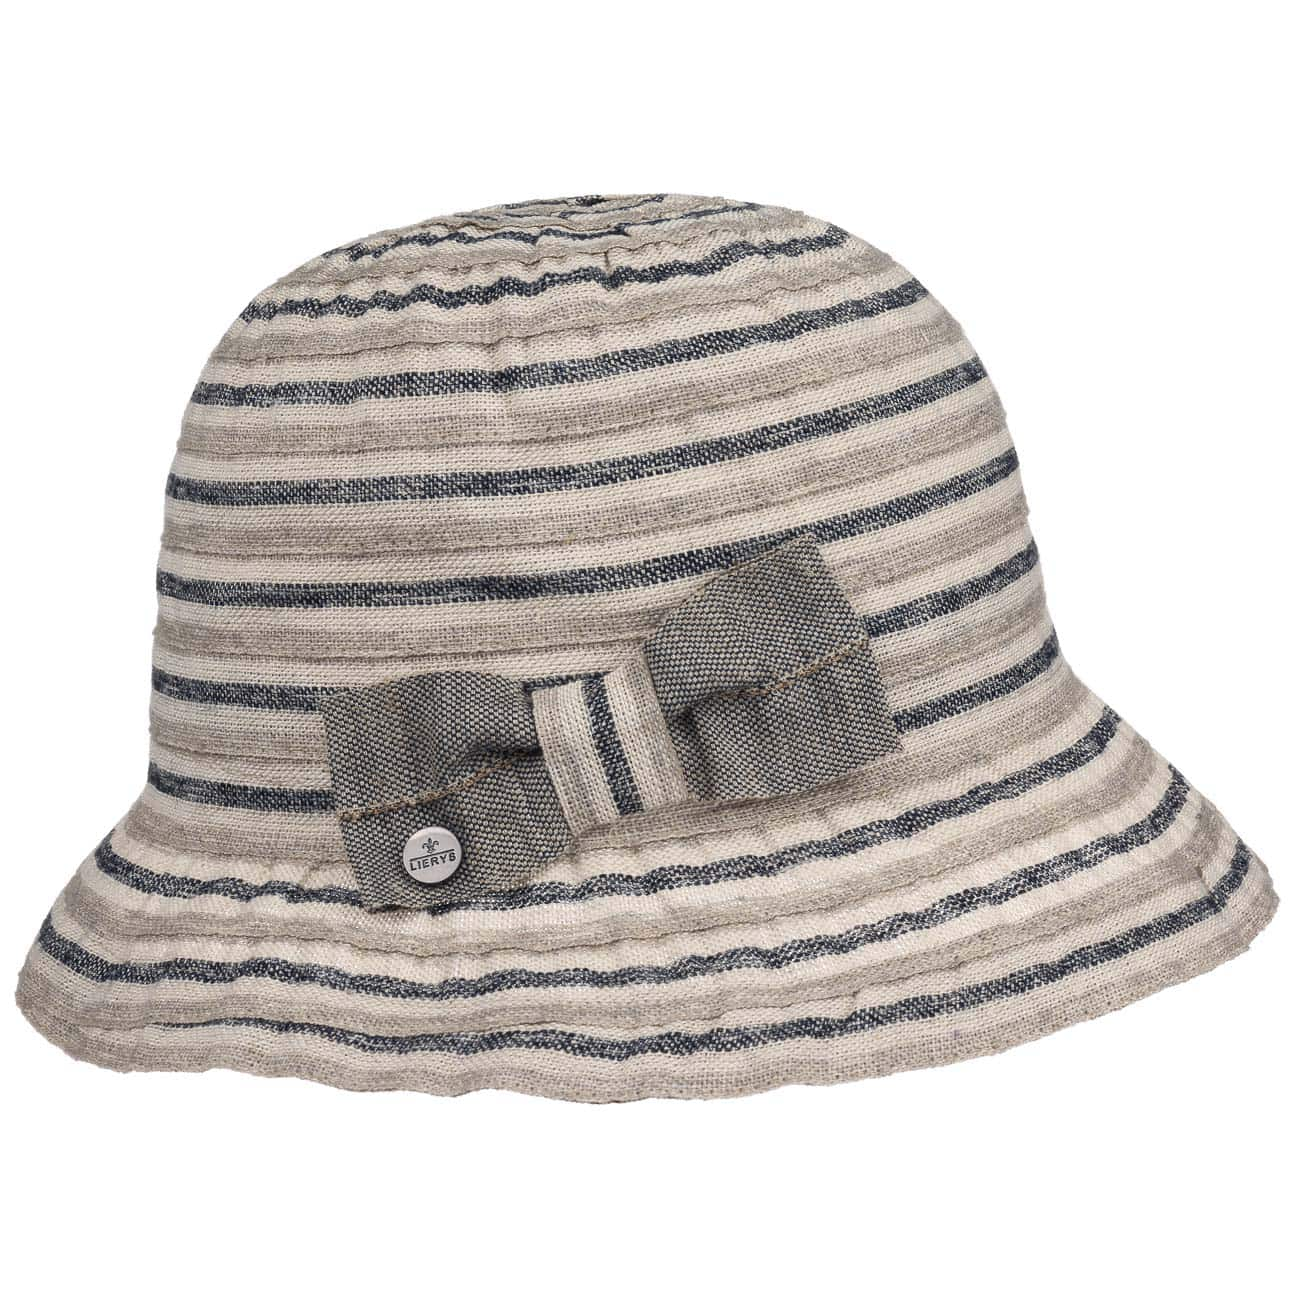 Multicolour Knit Hat with Flower by Lierys Cloth hats Lierys Em3zApuVk